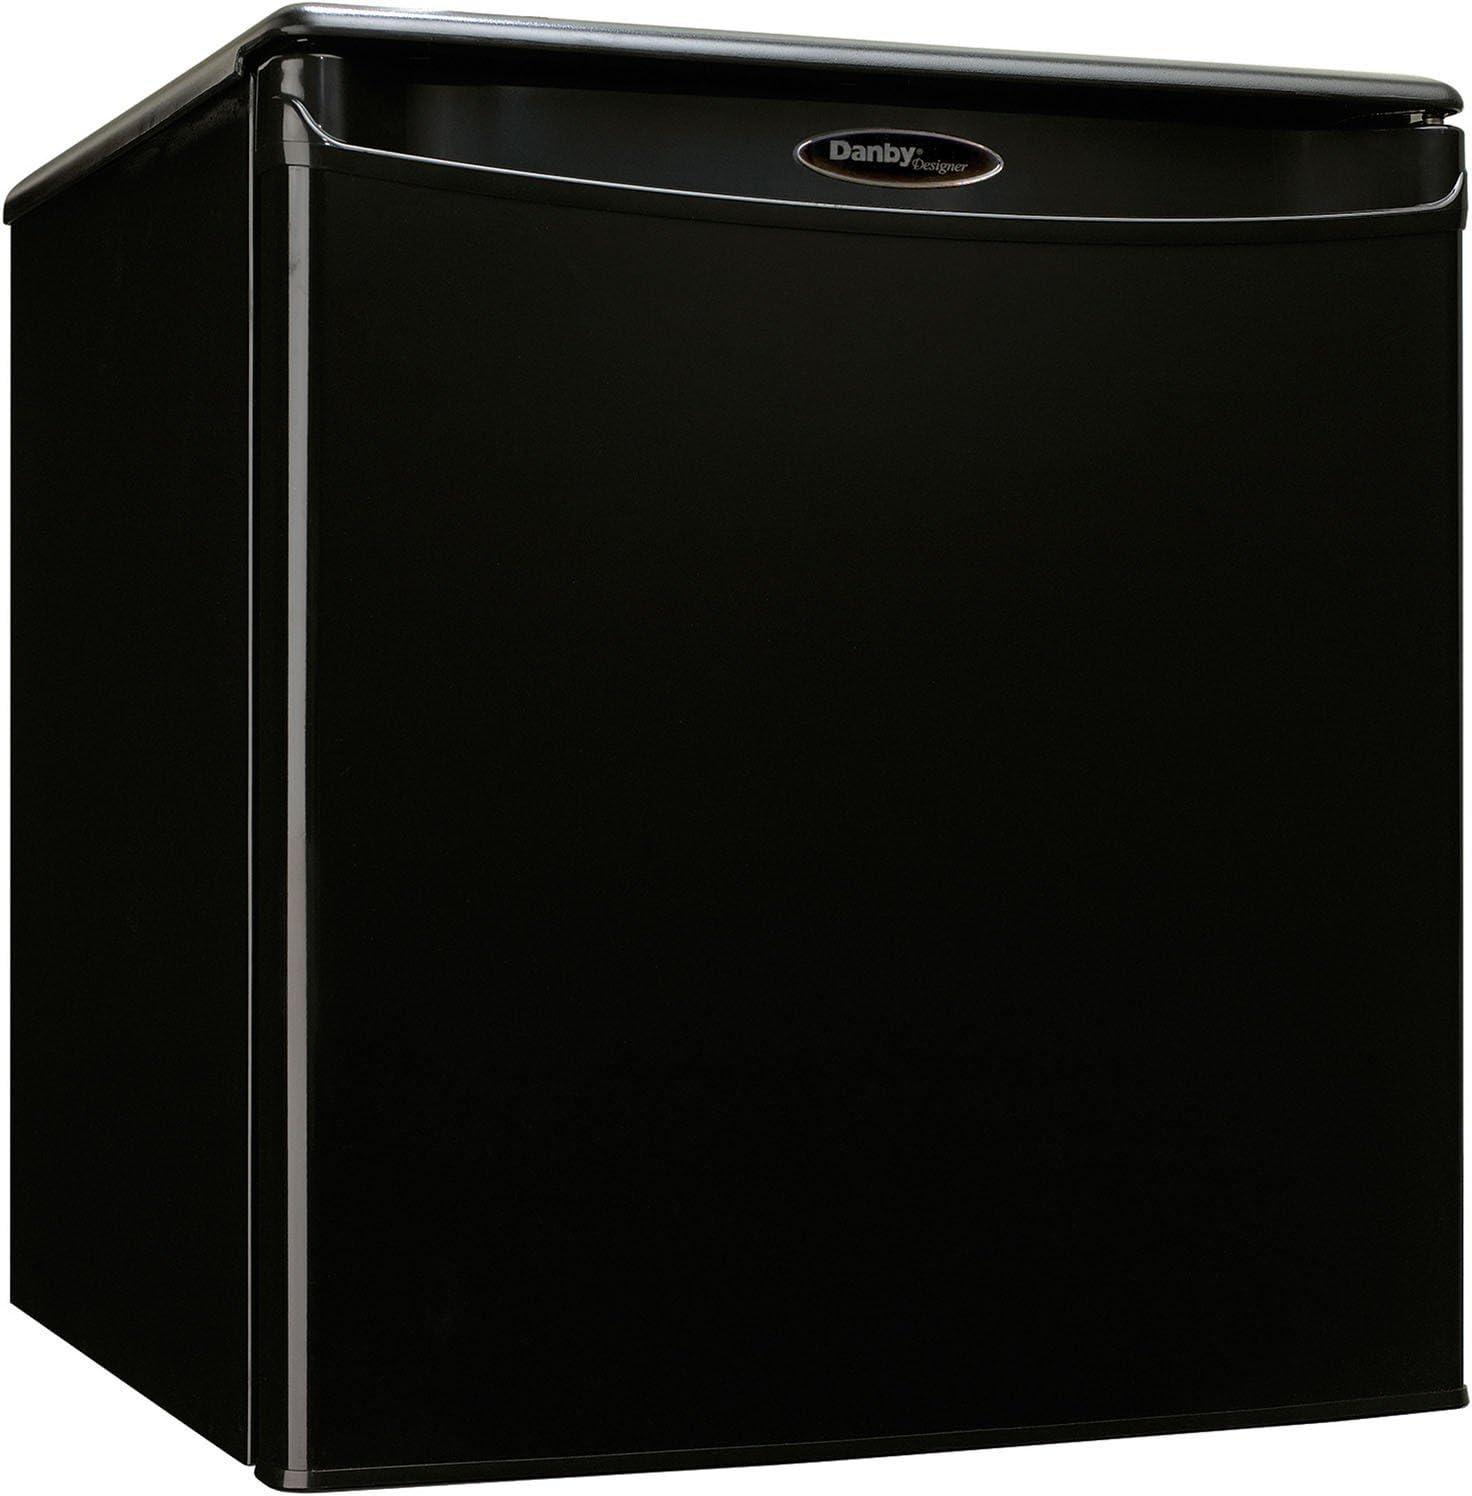 Premium Mini Fridge Shipping included Appliances Classic Compact Small Size Refr Apartment